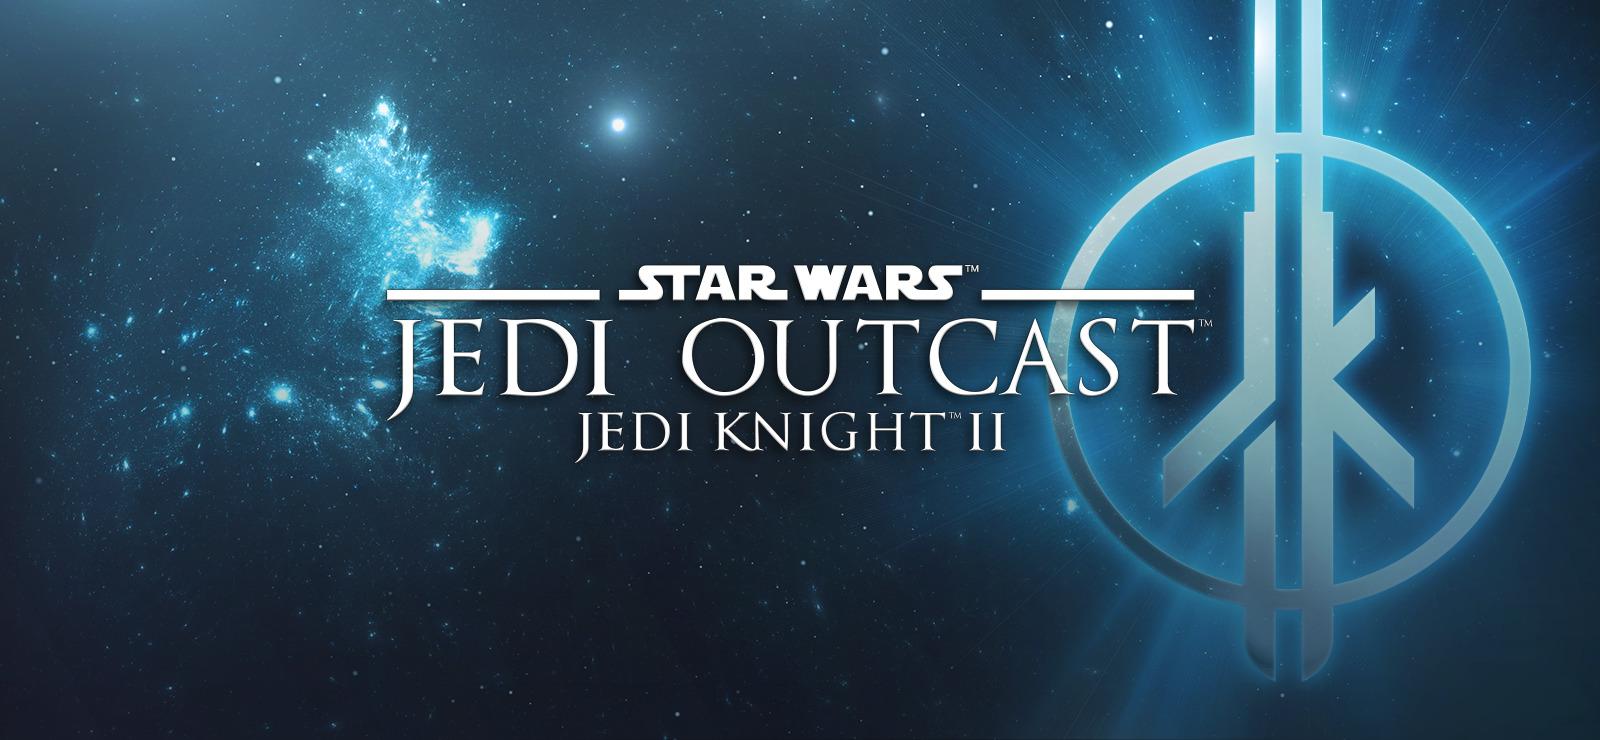 Vyšlo Star Wars Jedi Knight II Jedi Outcast pro PS4 a Nintendo Switch